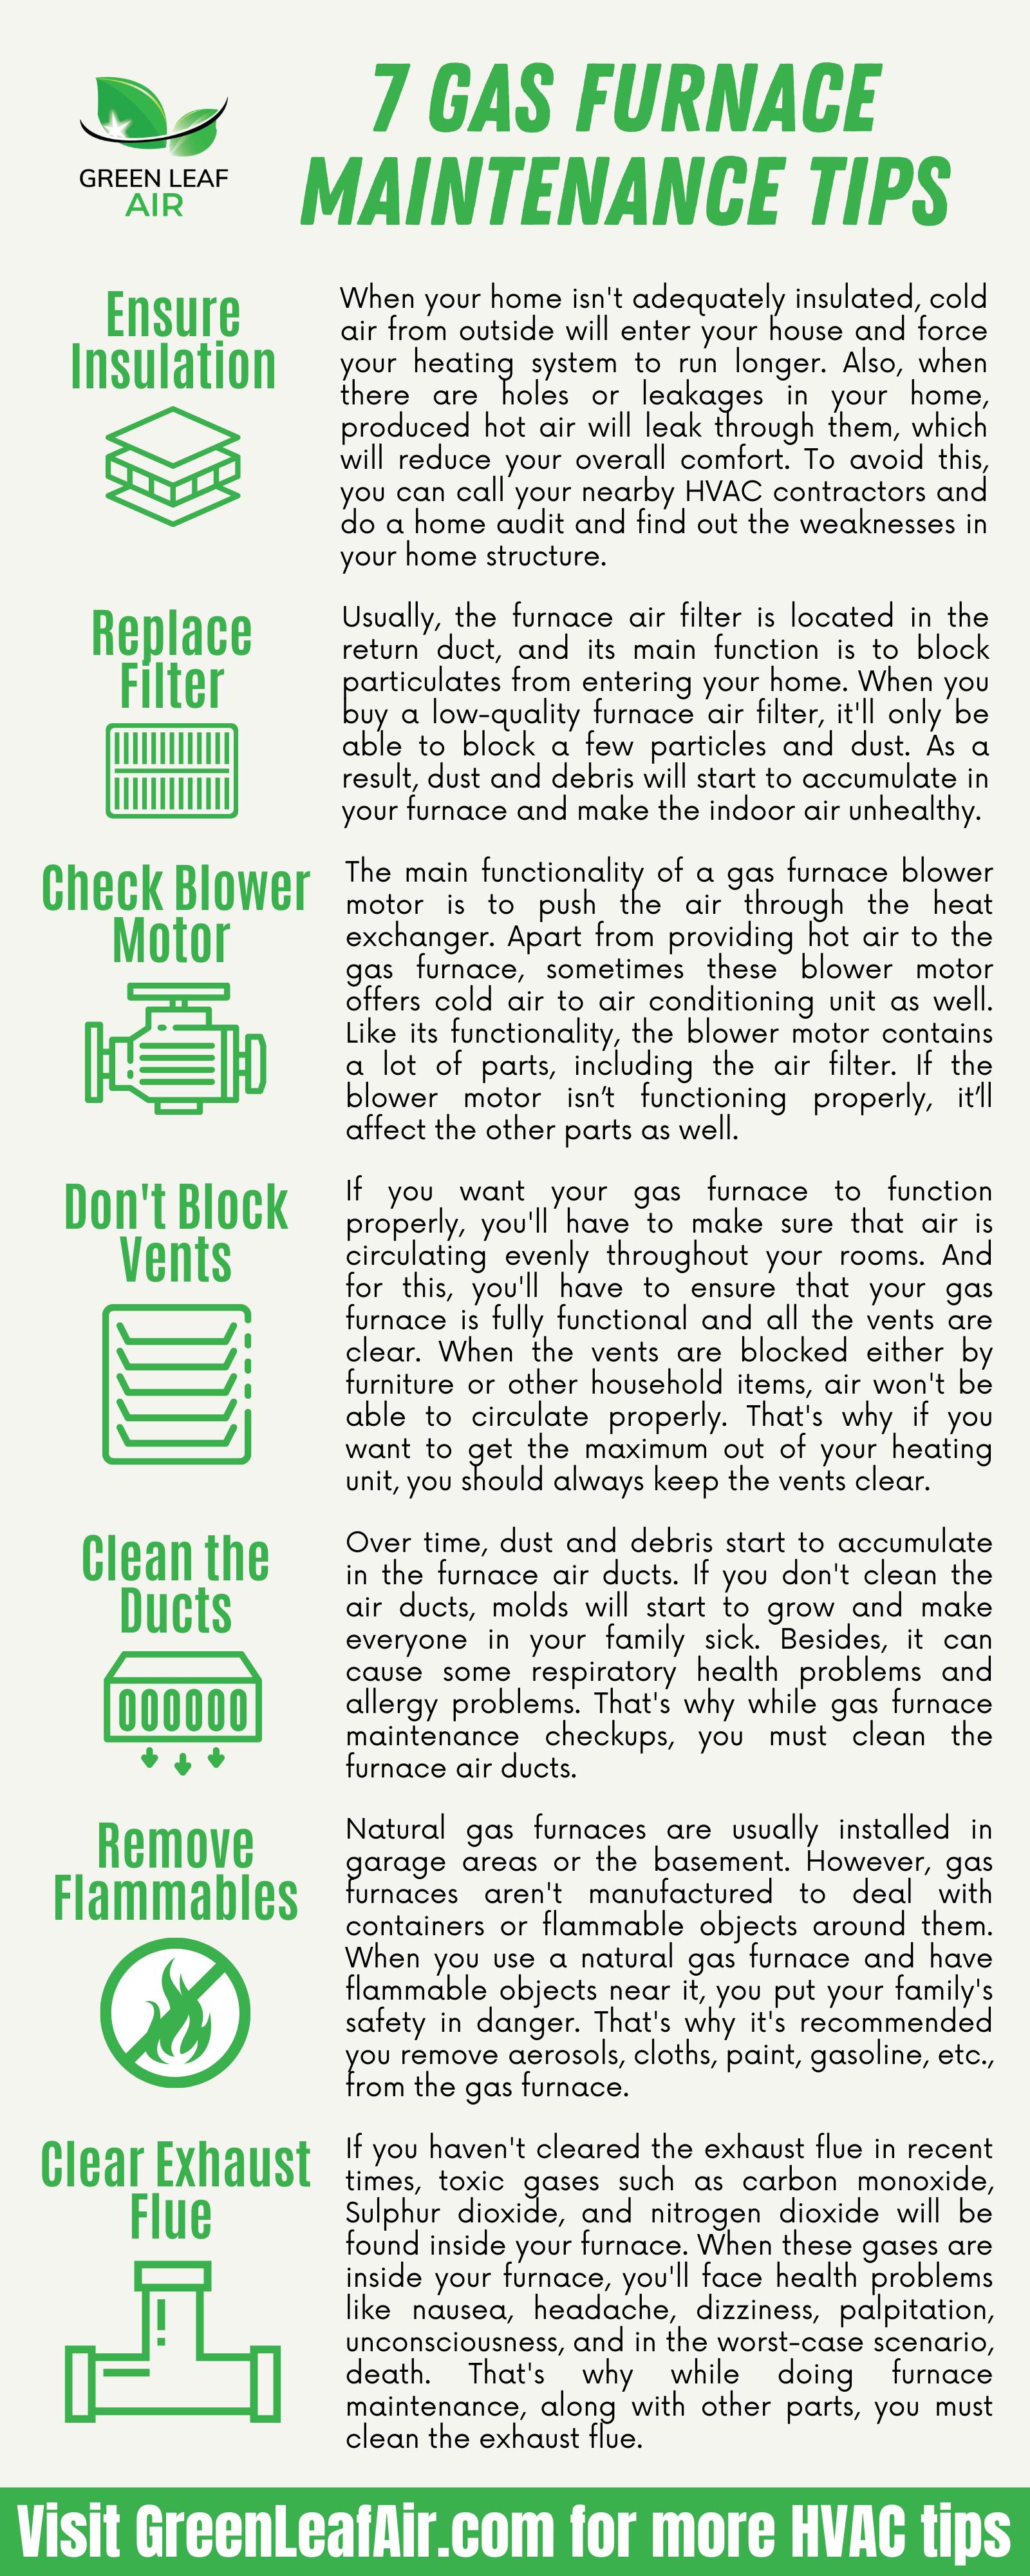 7 Gas Furnace Maintenance Tips